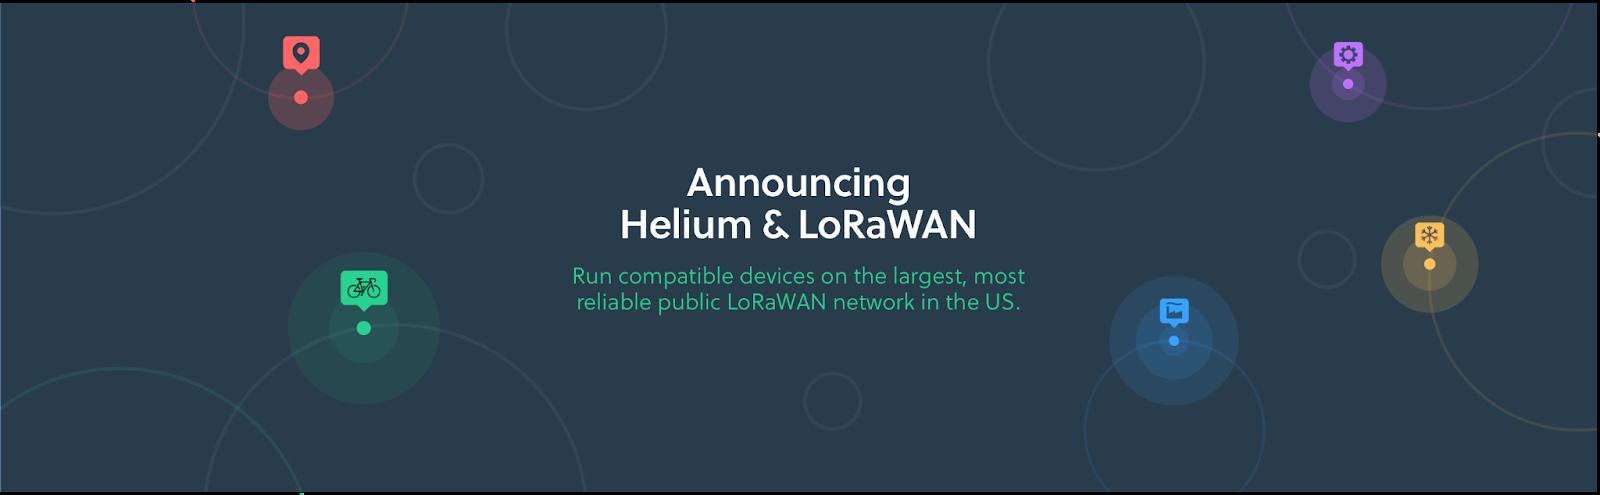 Blog LoRaWAN The People's Network